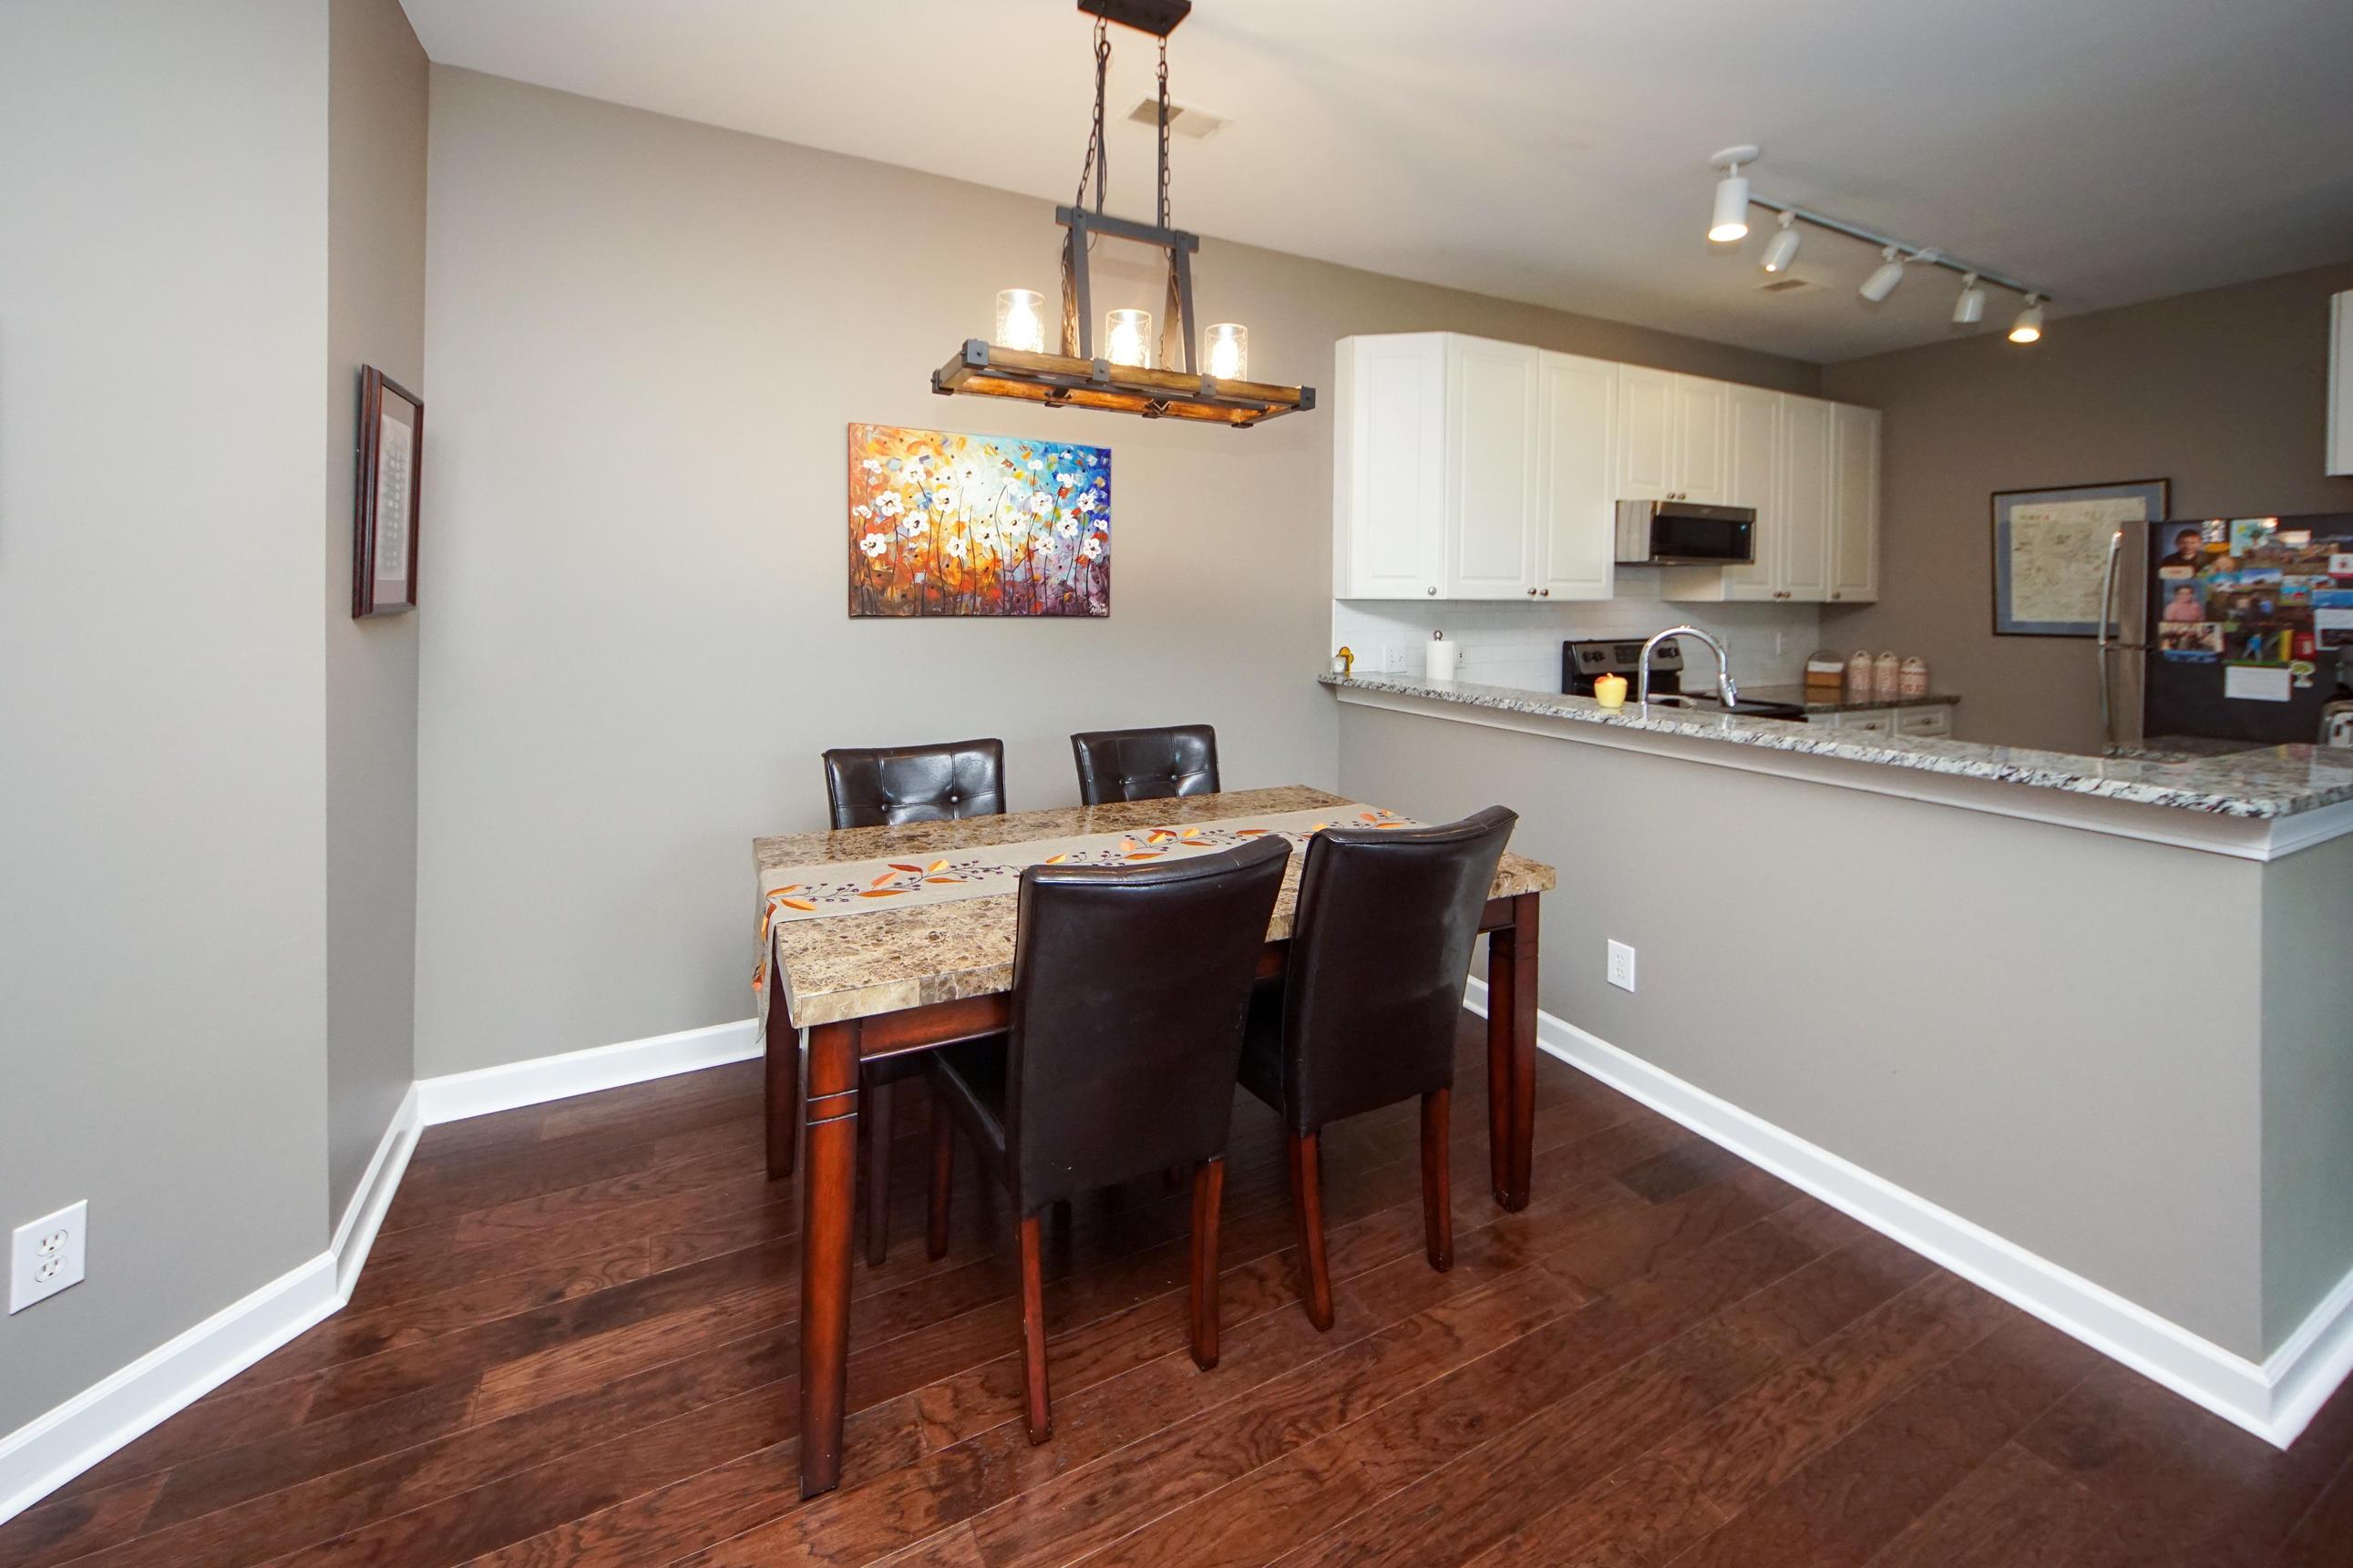 Dunes West Homes For Sale - 1631 Camfield, Mount Pleasant, SC - 32